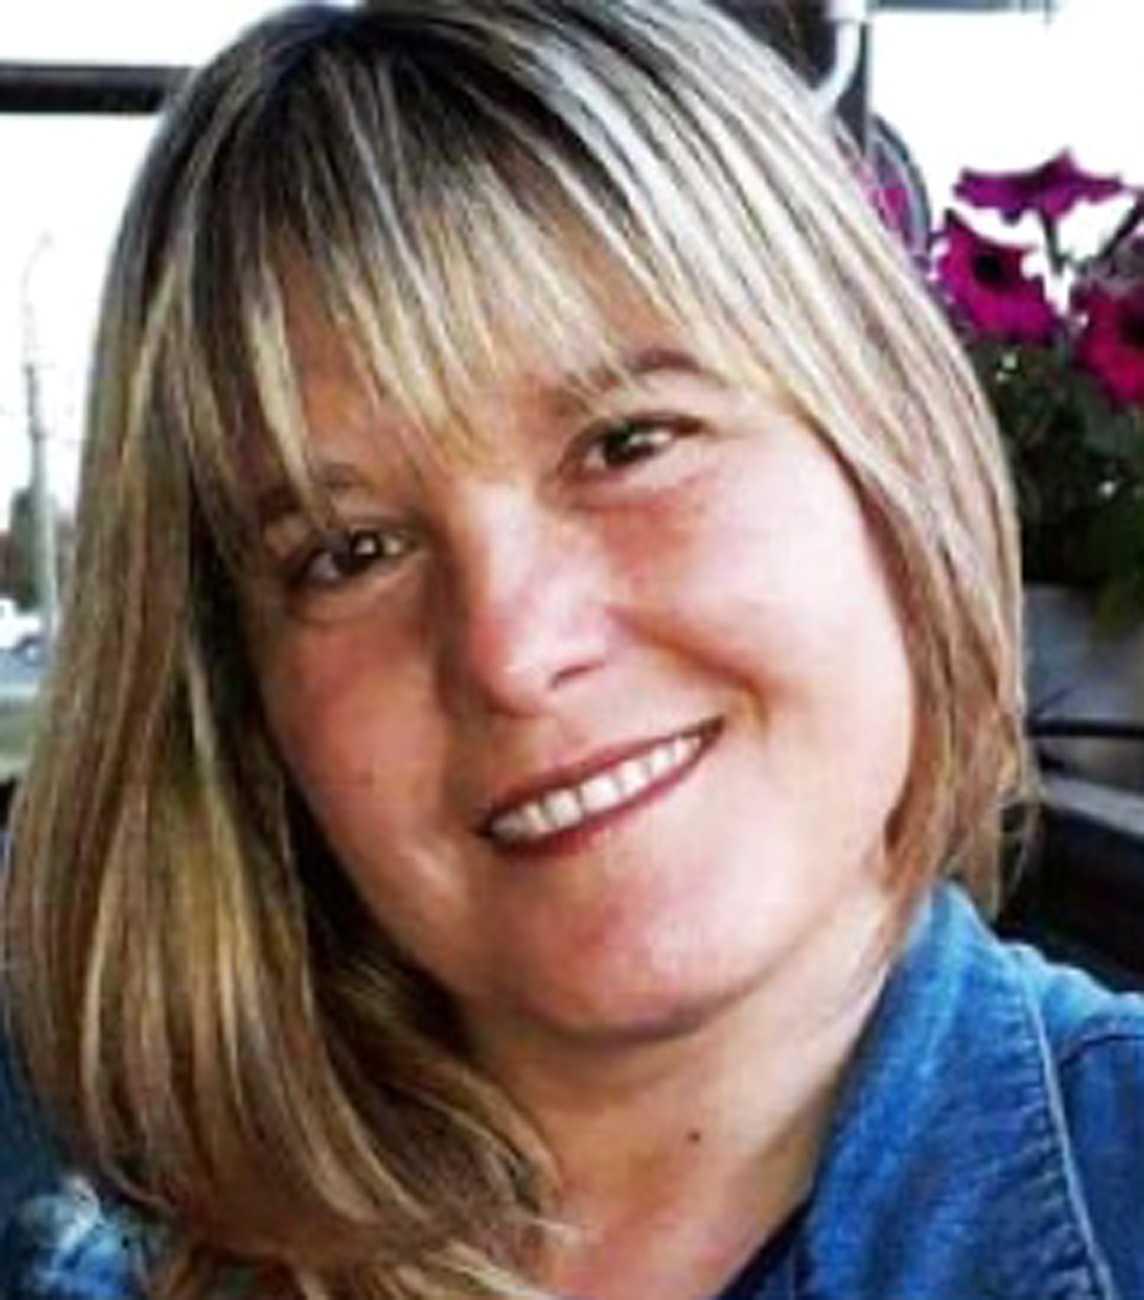 Mataron a una docente